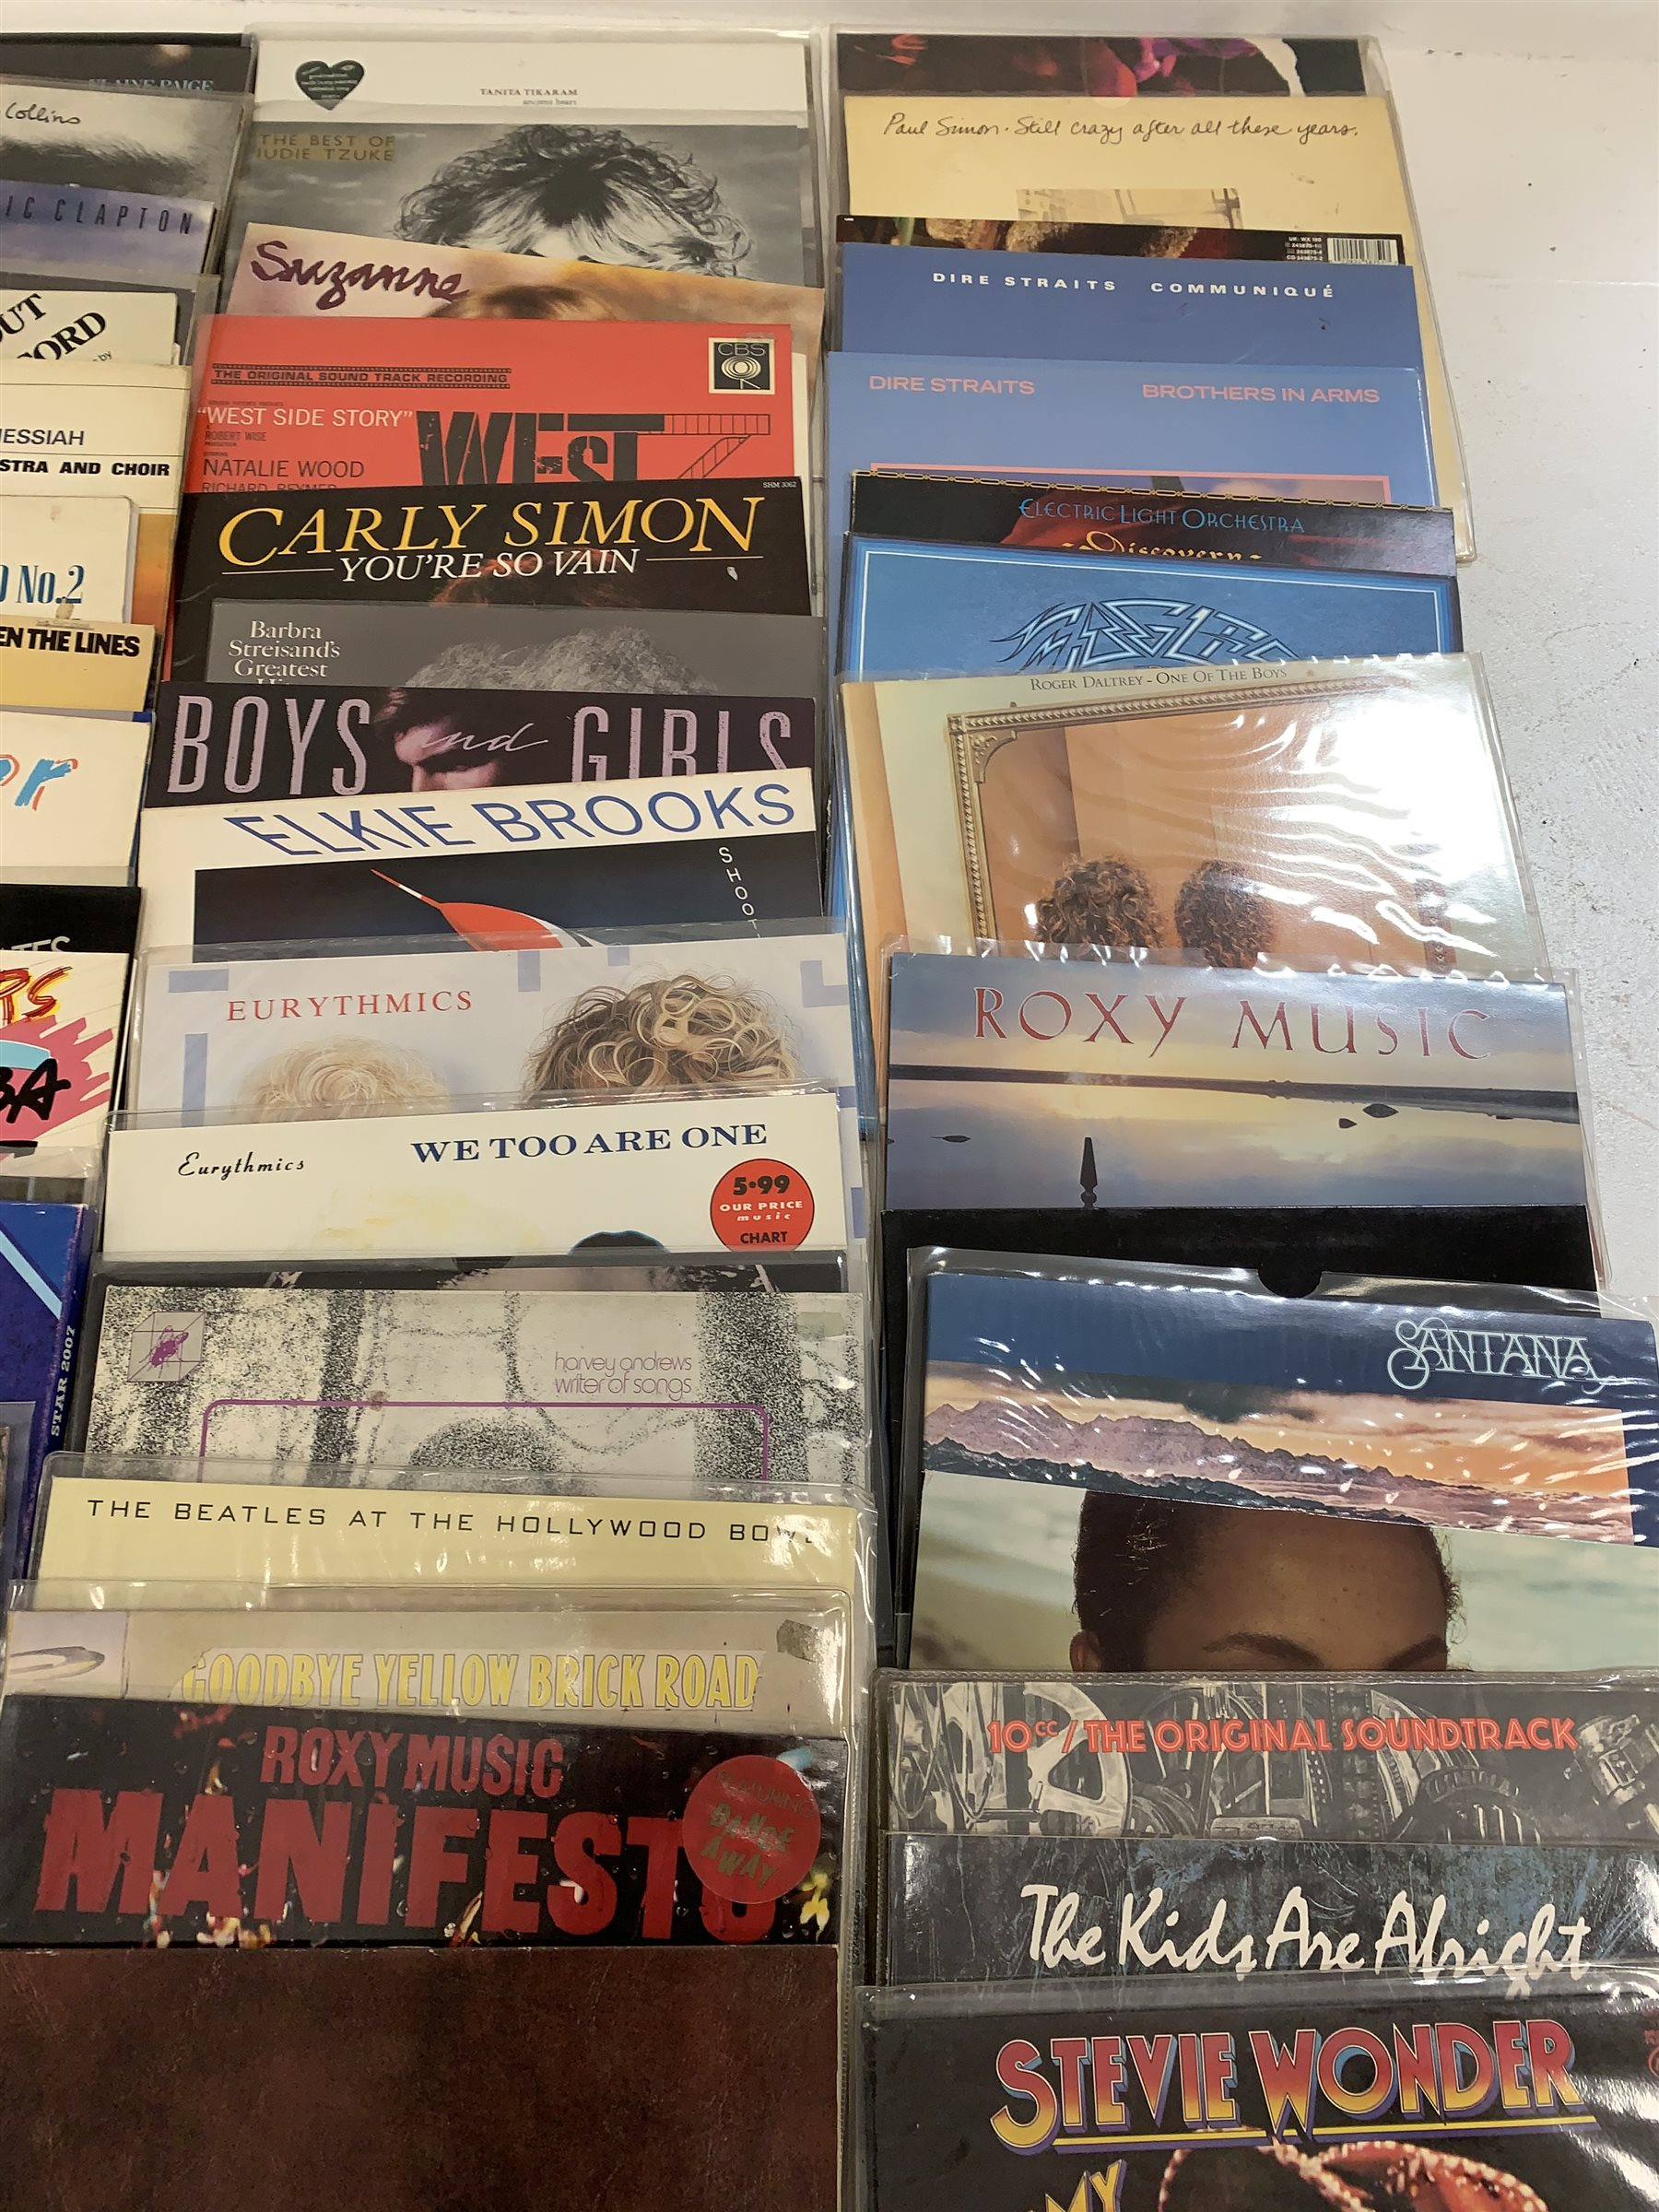 A quantity of LP's to include Elton John, Lionel Richie, Jimi Hendrix, The Beatles, Paul Simon, The - Image 3 of 7